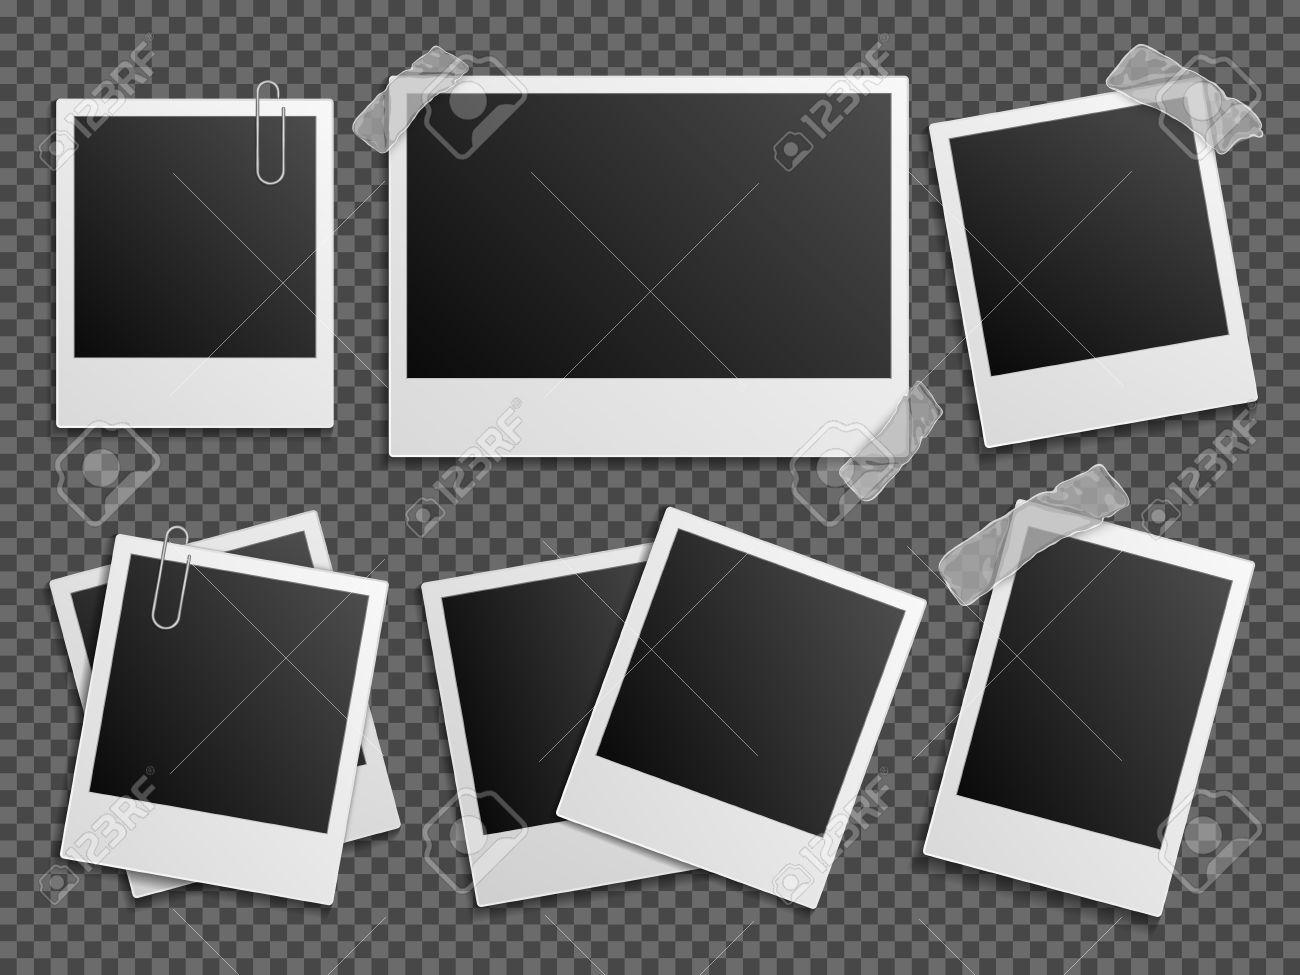 Retro-Foto-Vektor-Set. Polaroid-Rahmen Für Familienalbum. Leere ...